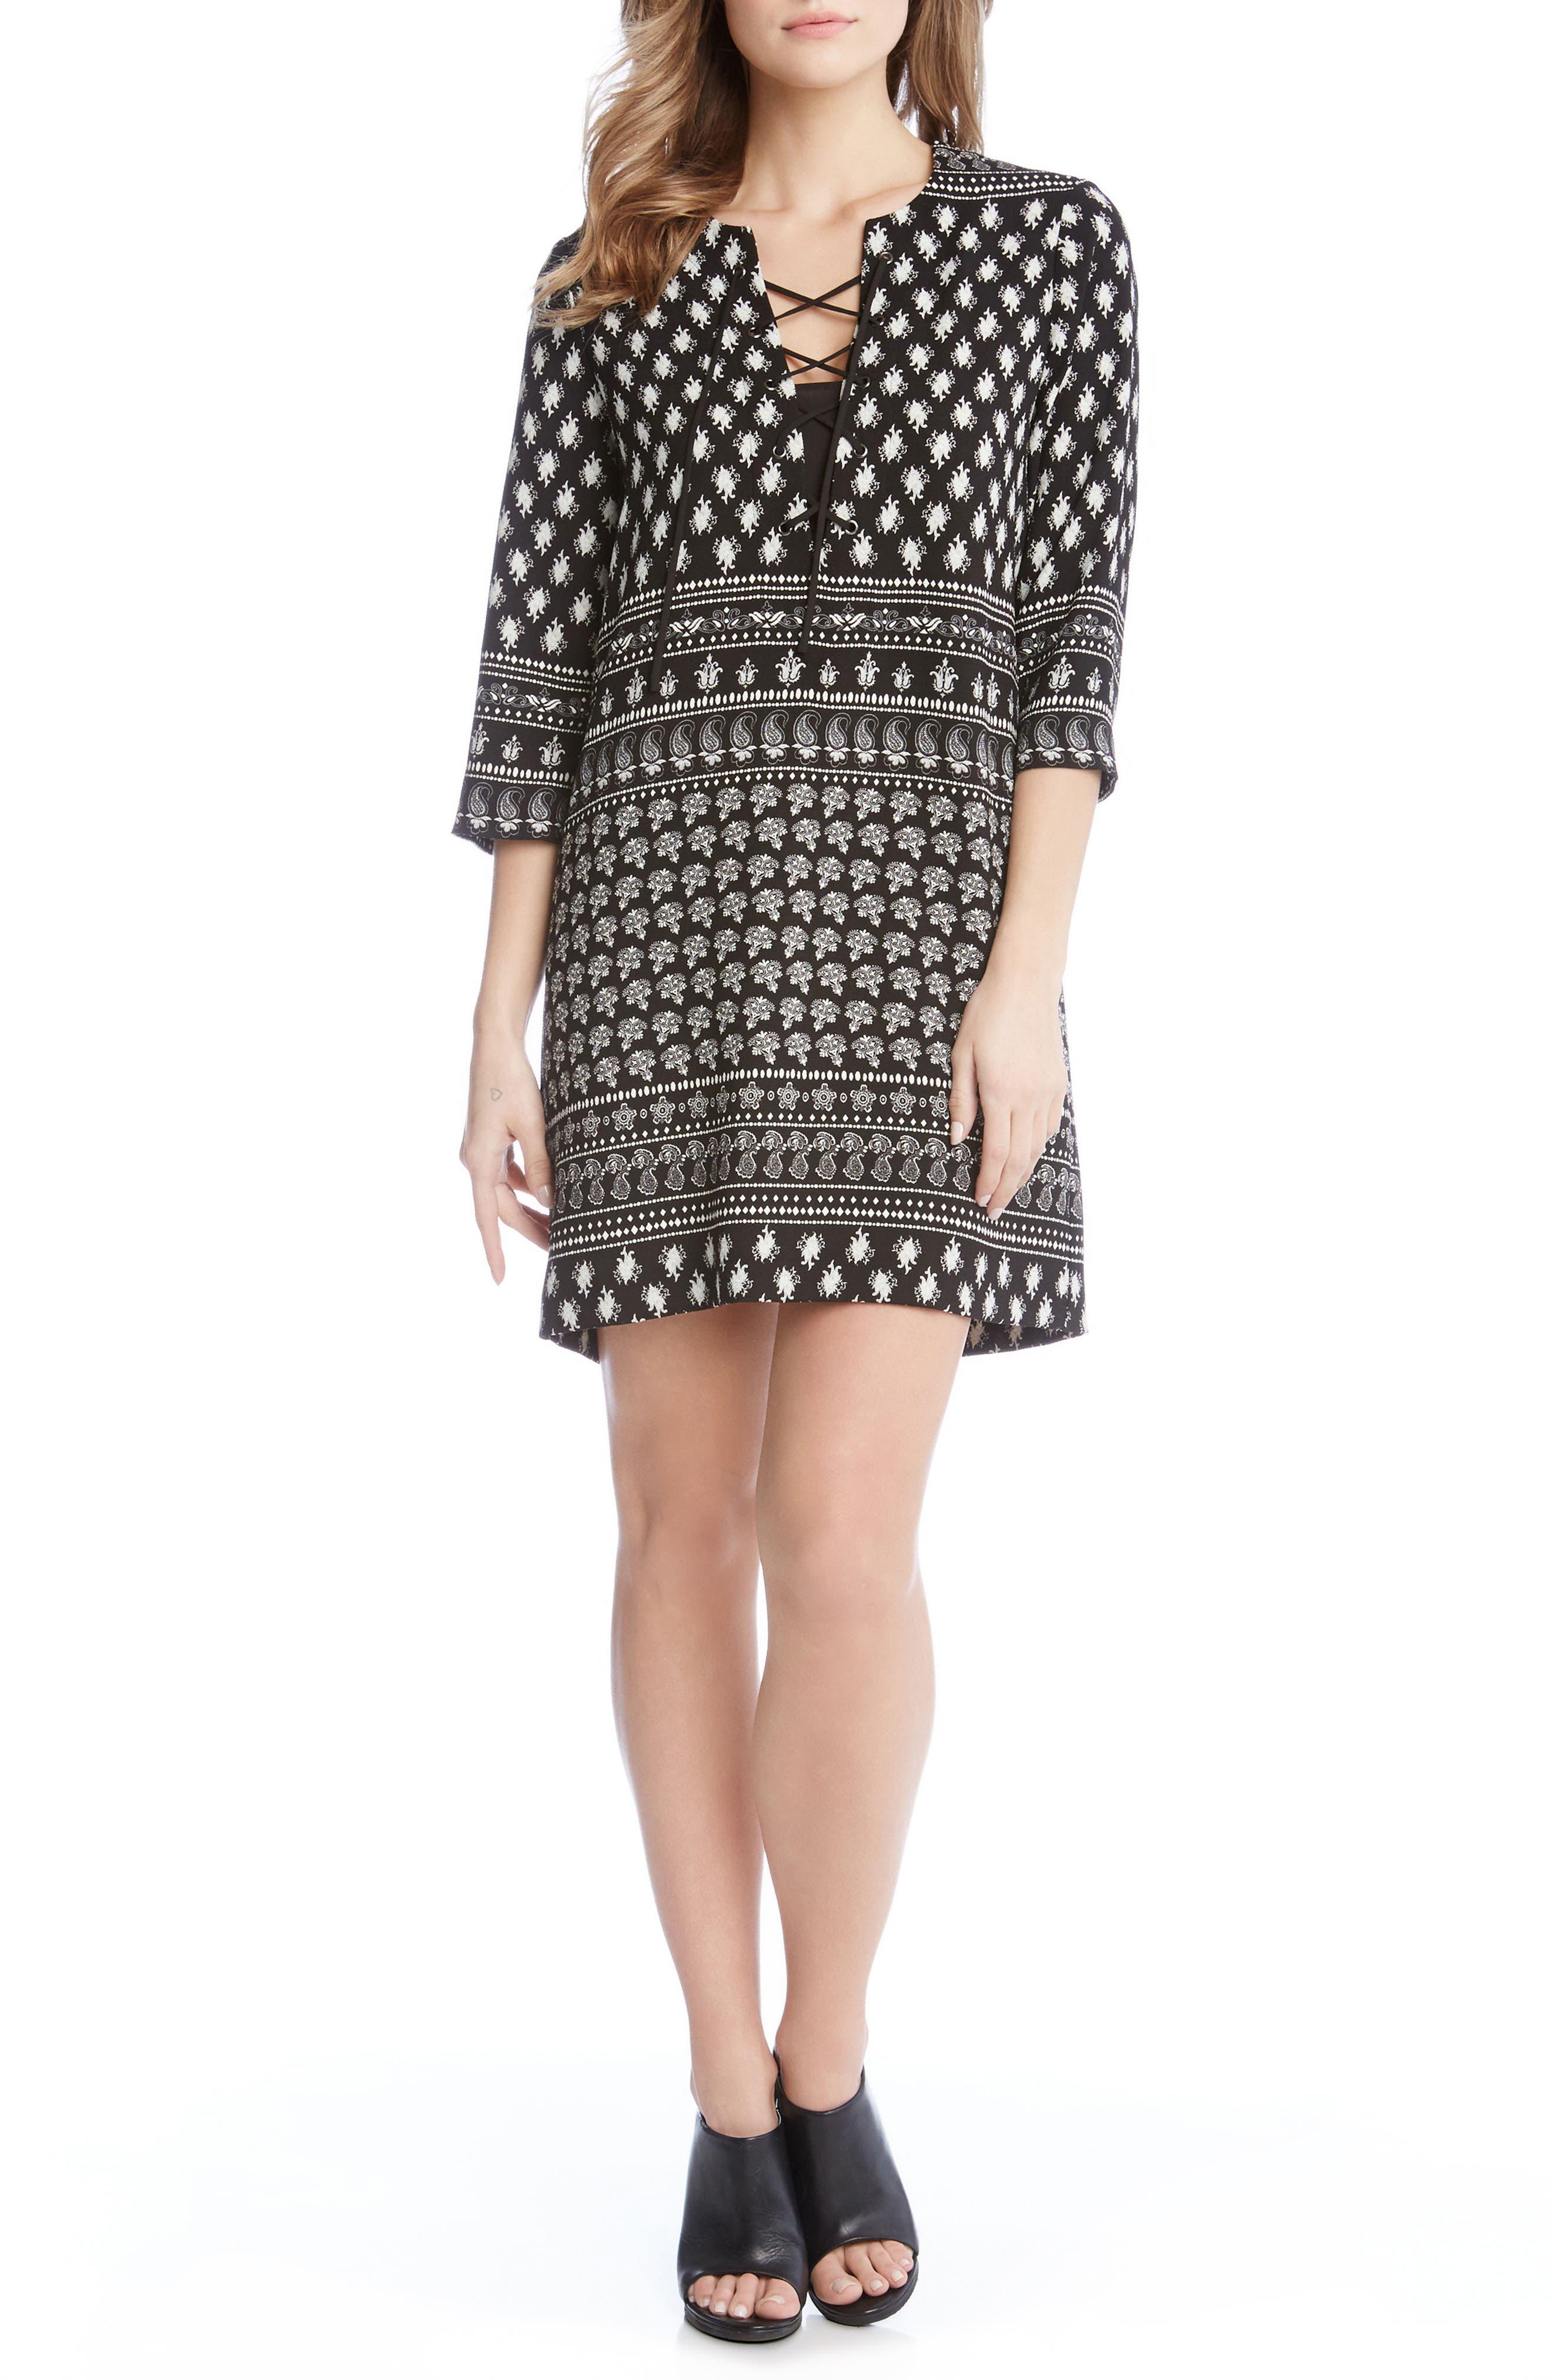 Alternate Image 1 Selected - Karen Kane Print Lace-Up Shift Dress